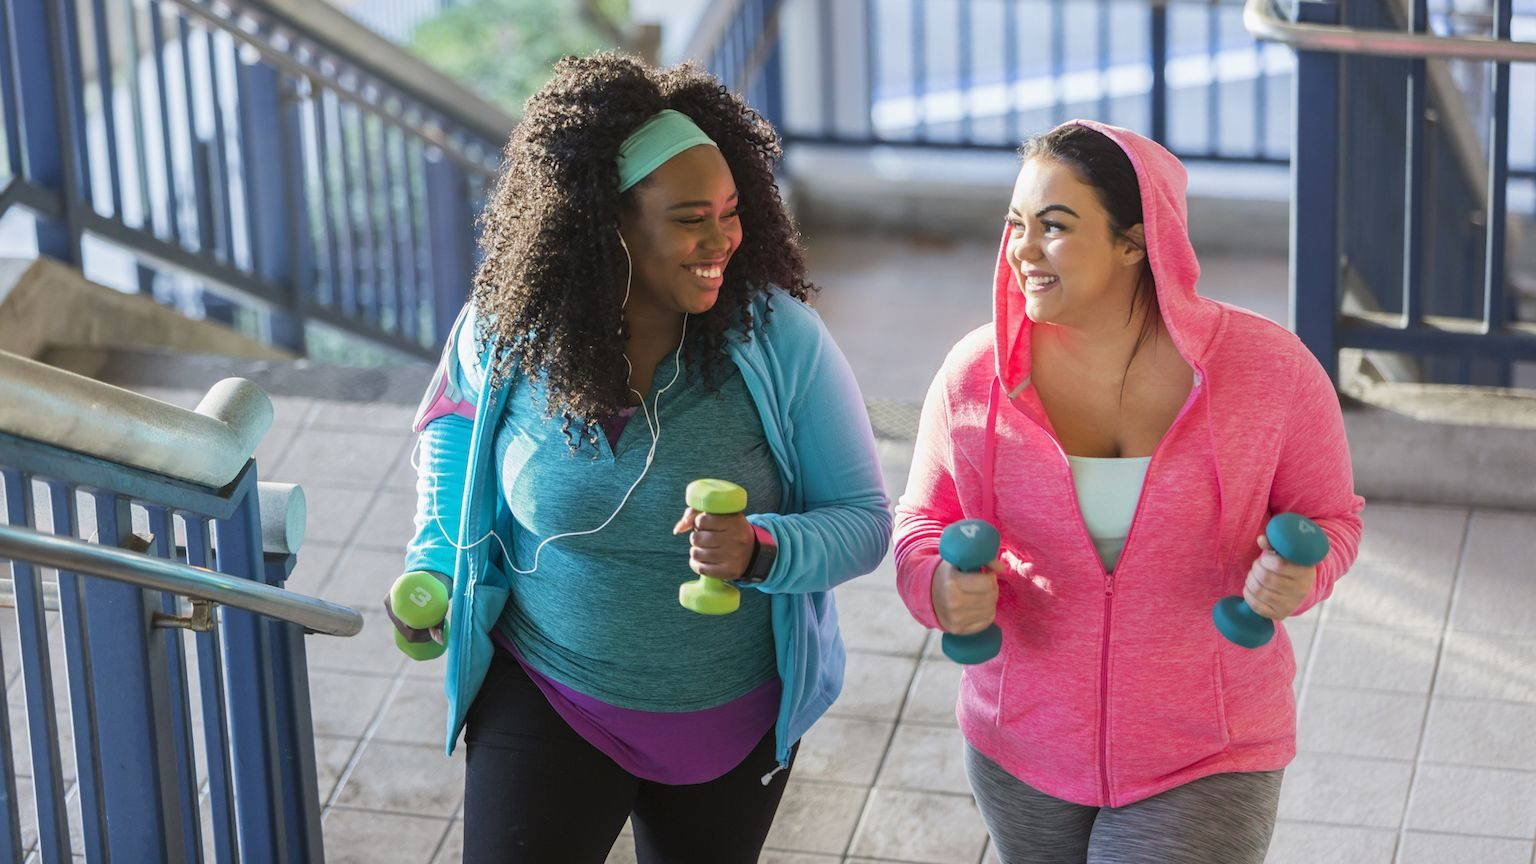 Women doing outdoor exercise